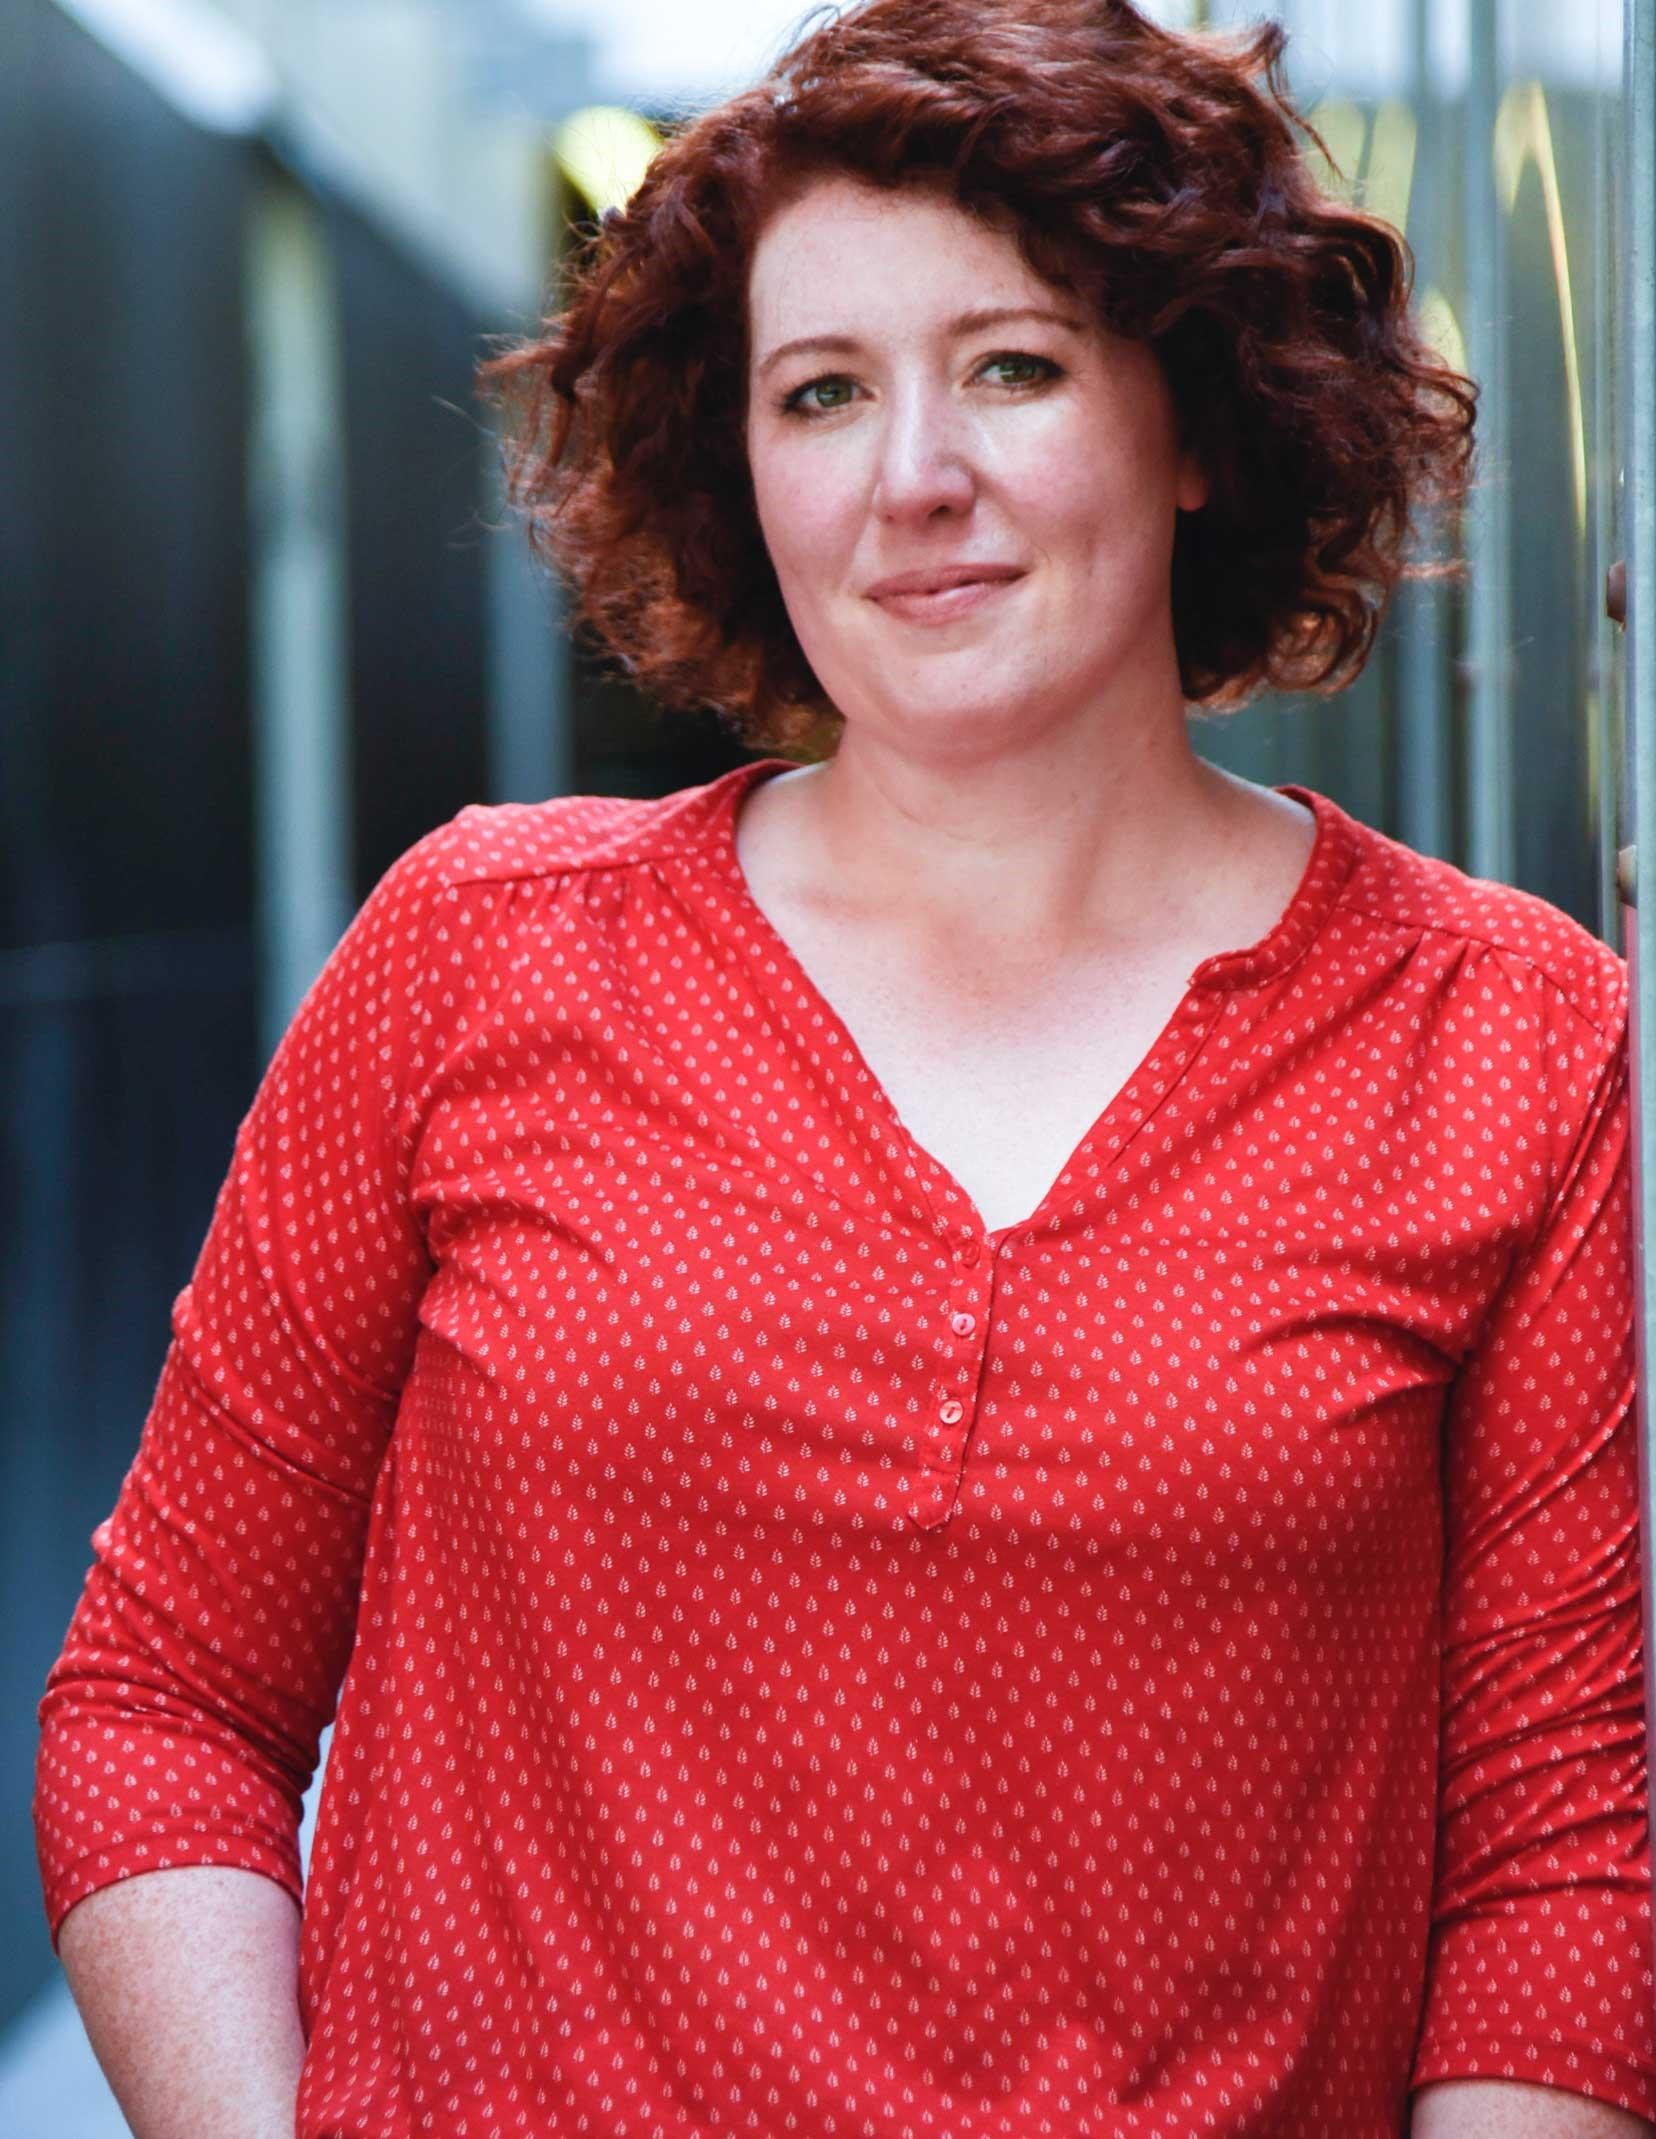 Meet Author Jane Harper in Conversation with David Baldacci (Virtual)